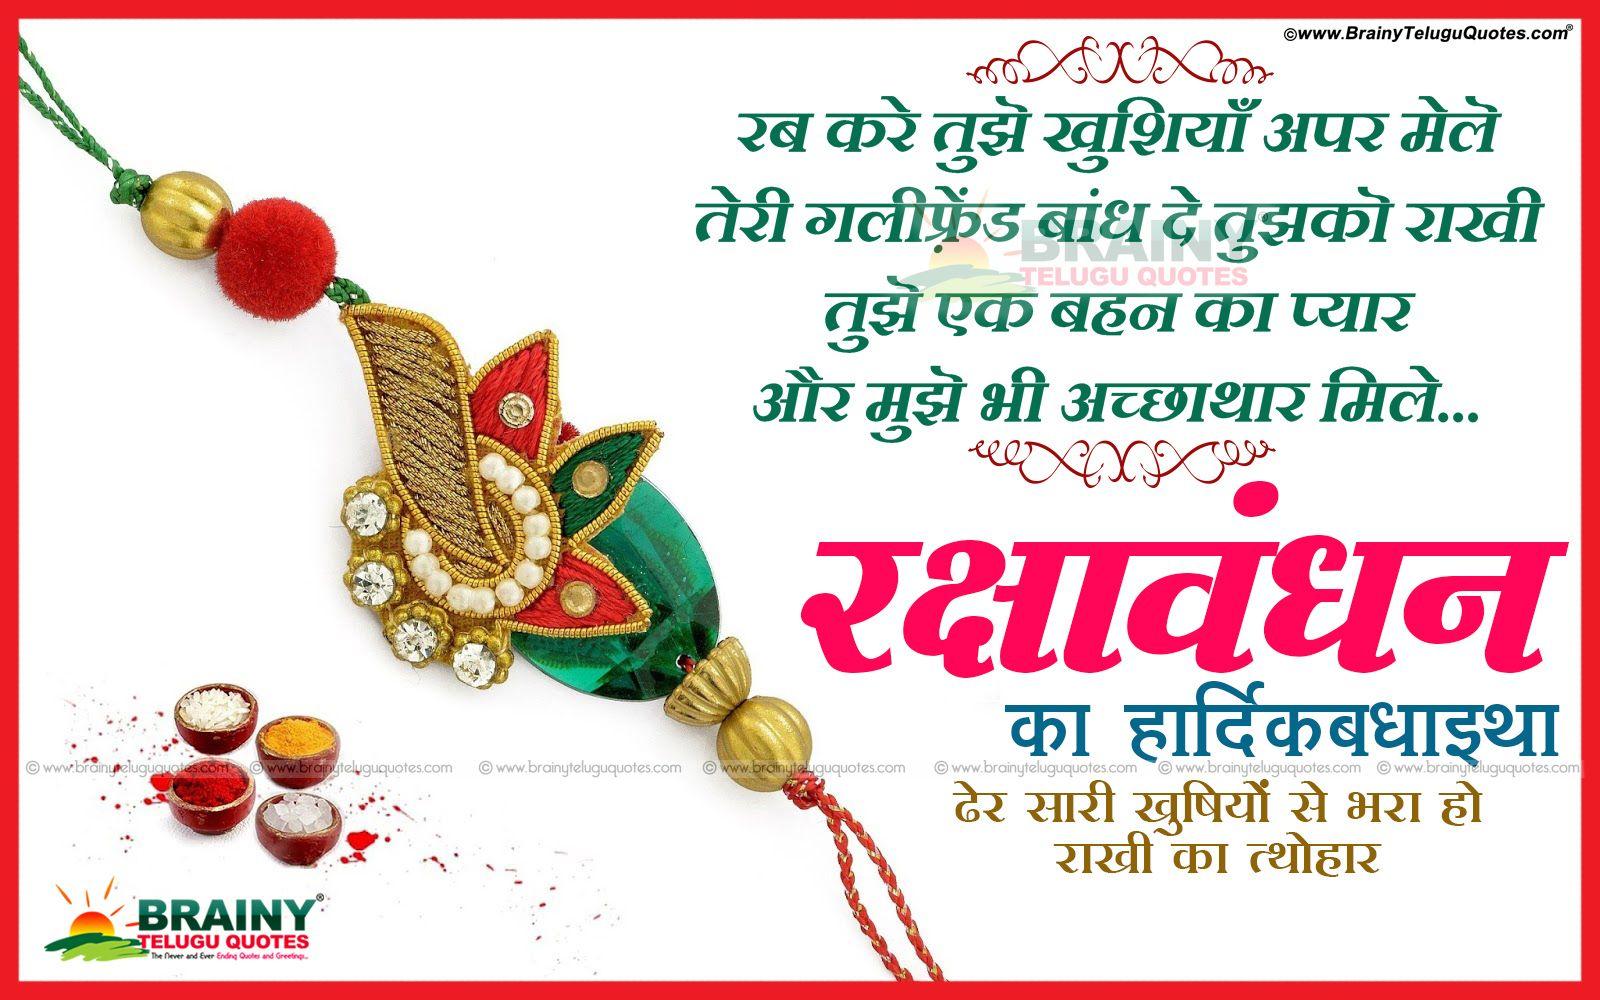 Raksha Bandhan Shayari In Hindi Jpg 1600 1000 Raksha Bandhan Wishes Happy Rakshabandhan Happy Raksha Bandhan Quotes